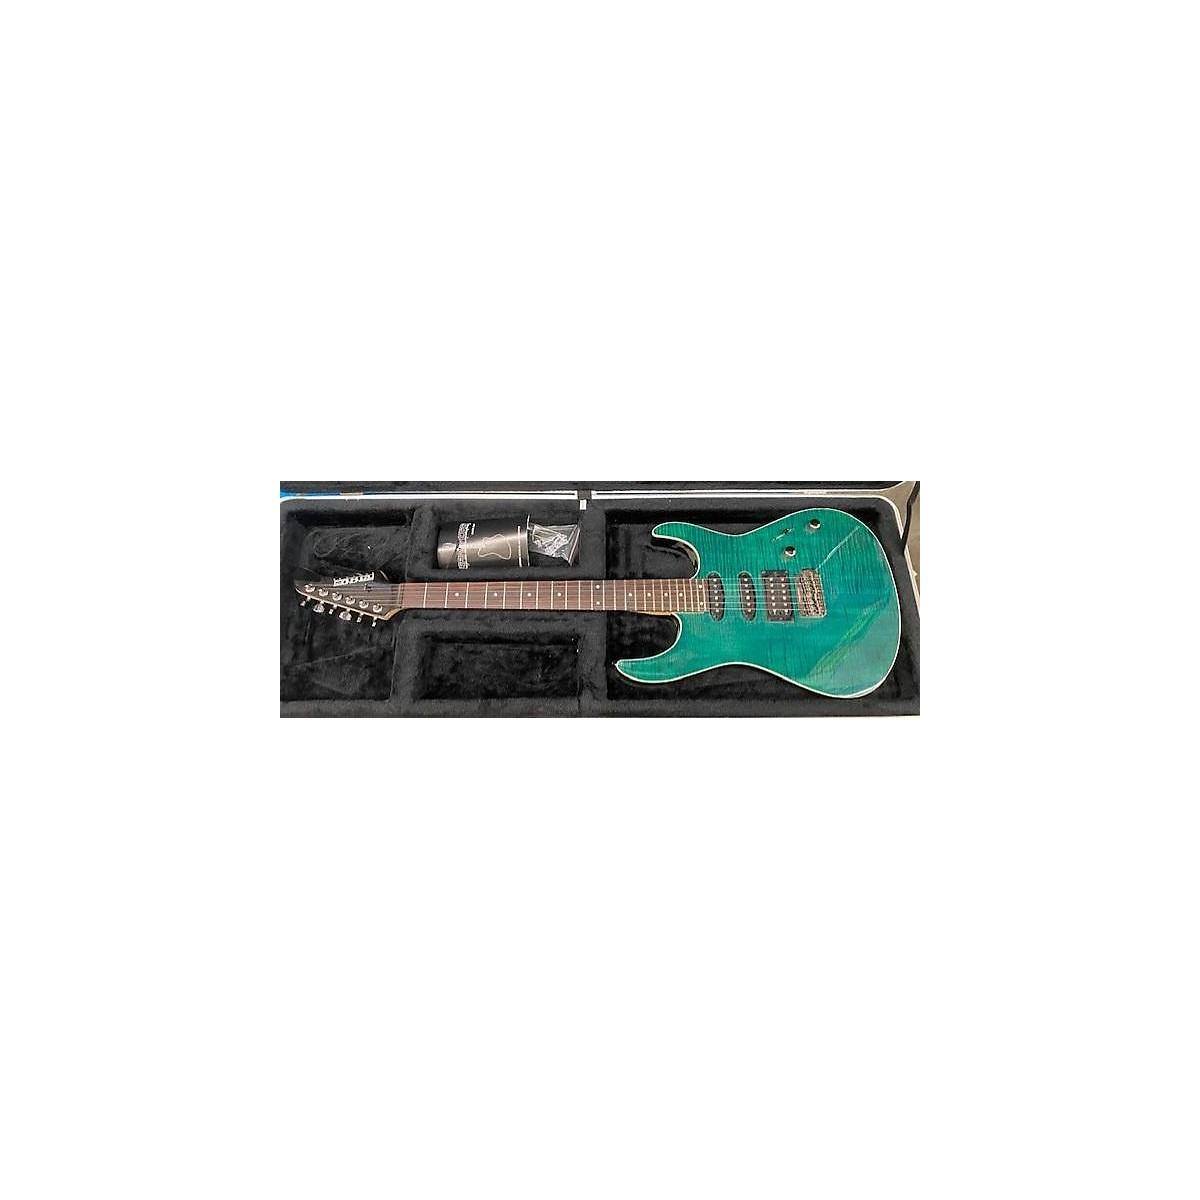 Fernandes 2000s Fr-40 Solid Body Electric Guitar